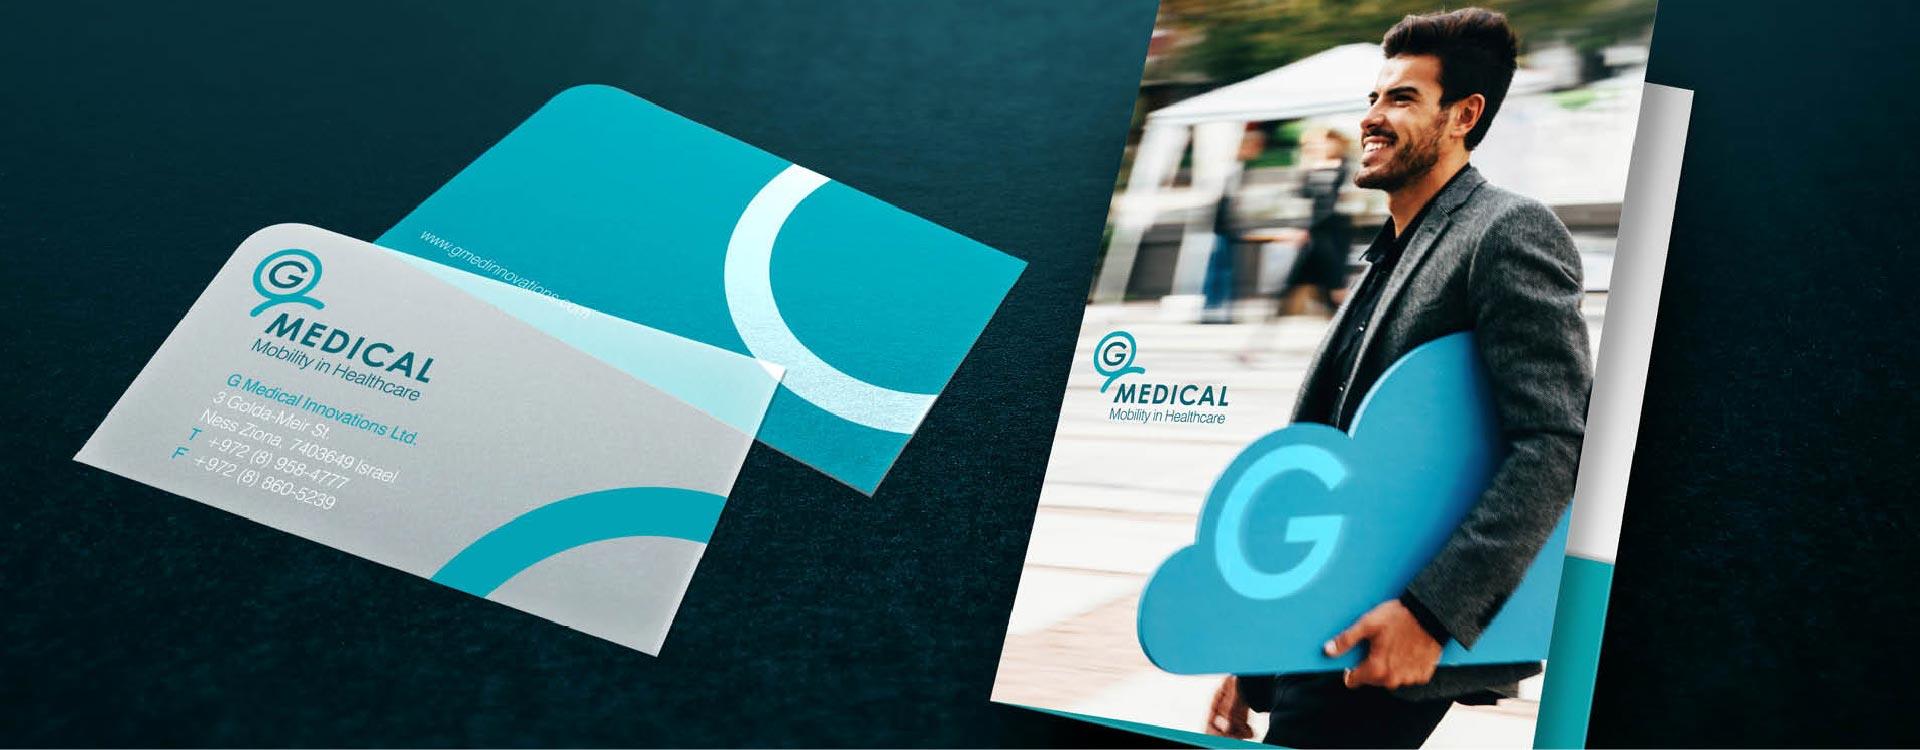 G MEDICAL